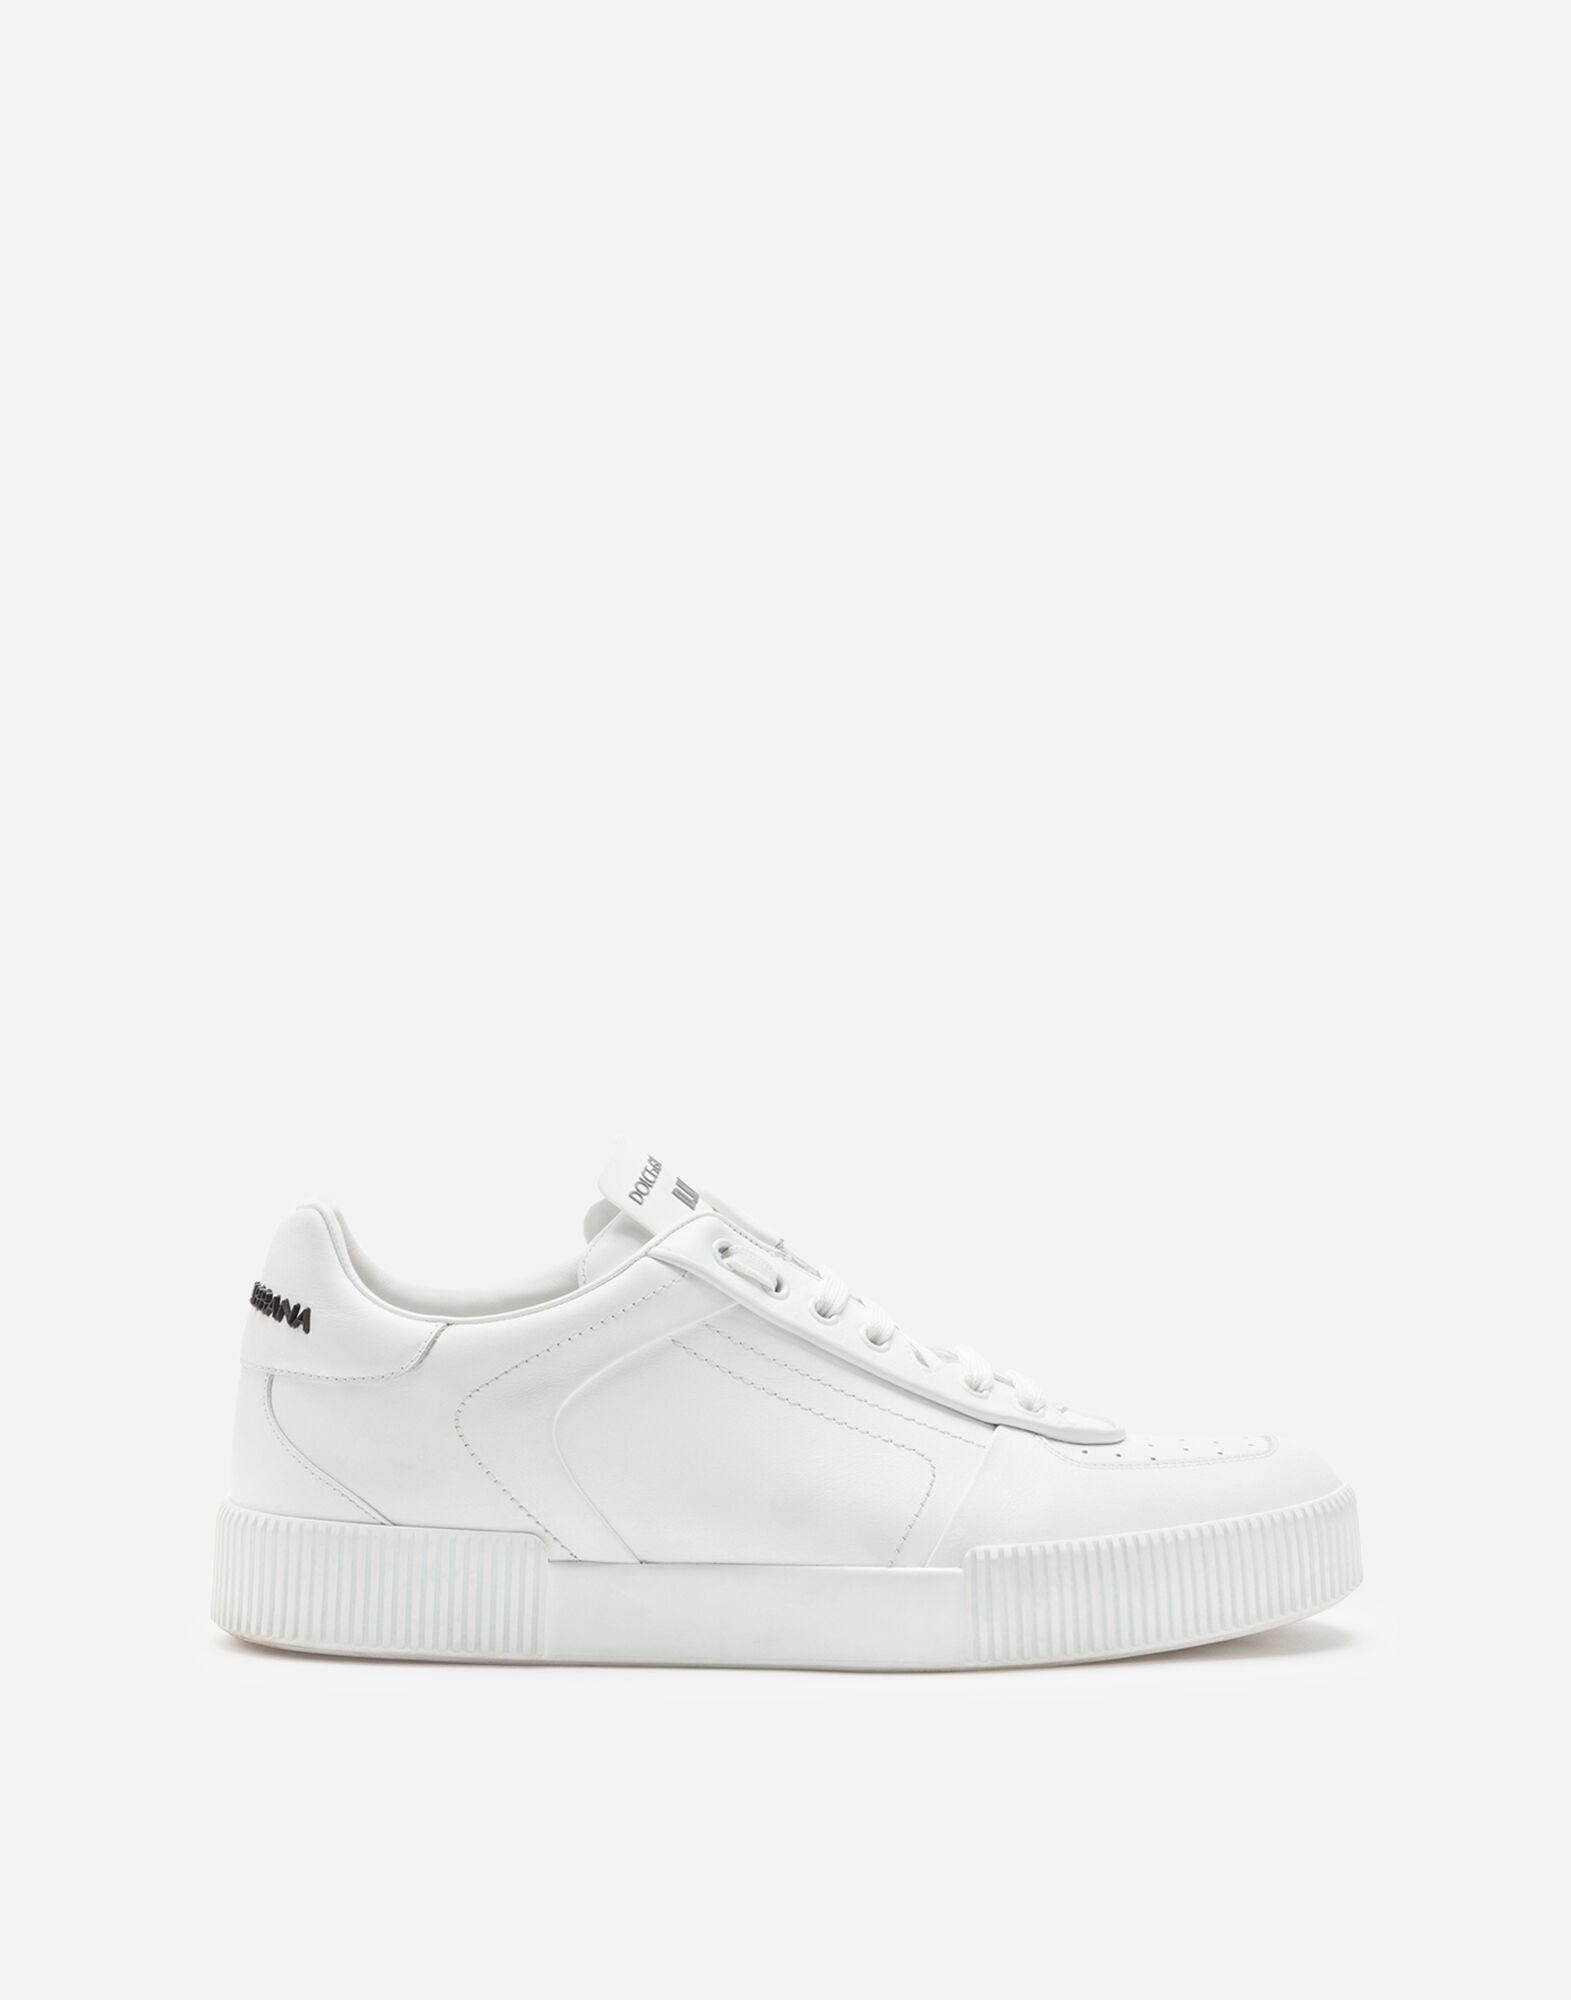 HommeDolce Pour Et On amp;gabbana Sneakers Slip 4L3jAq5R